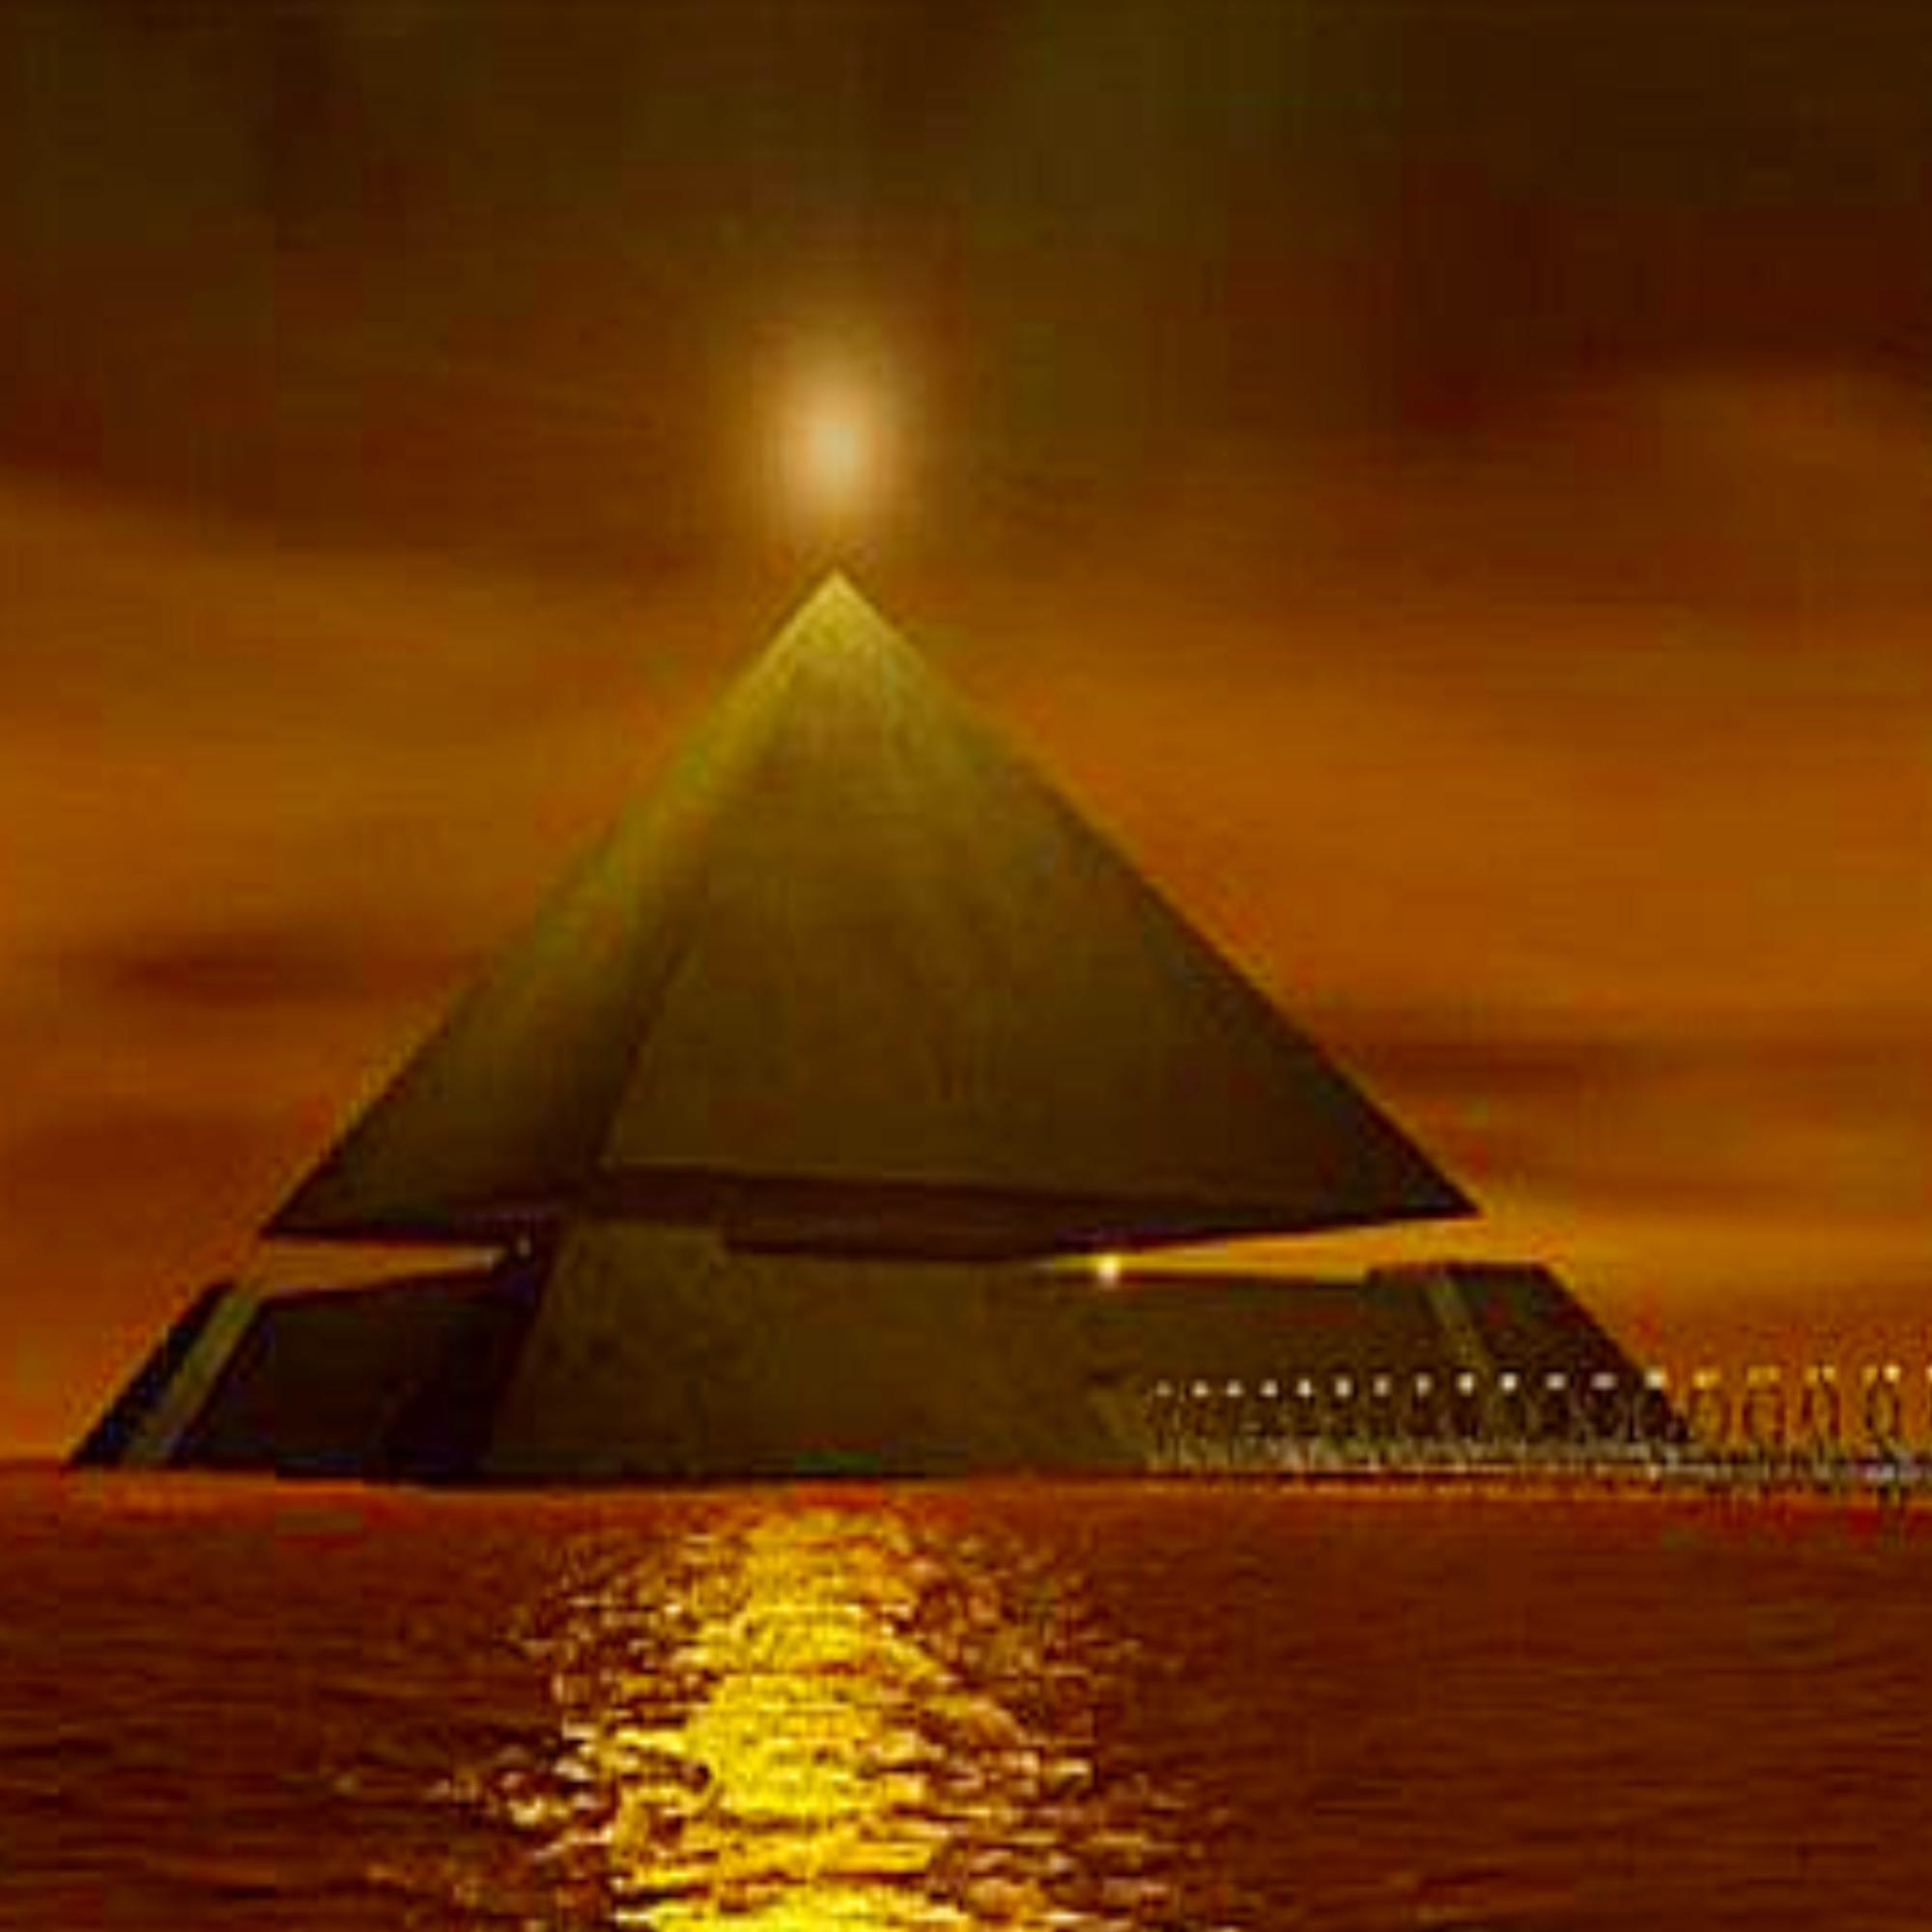 File:The Pyramid of Shinnok.jpg